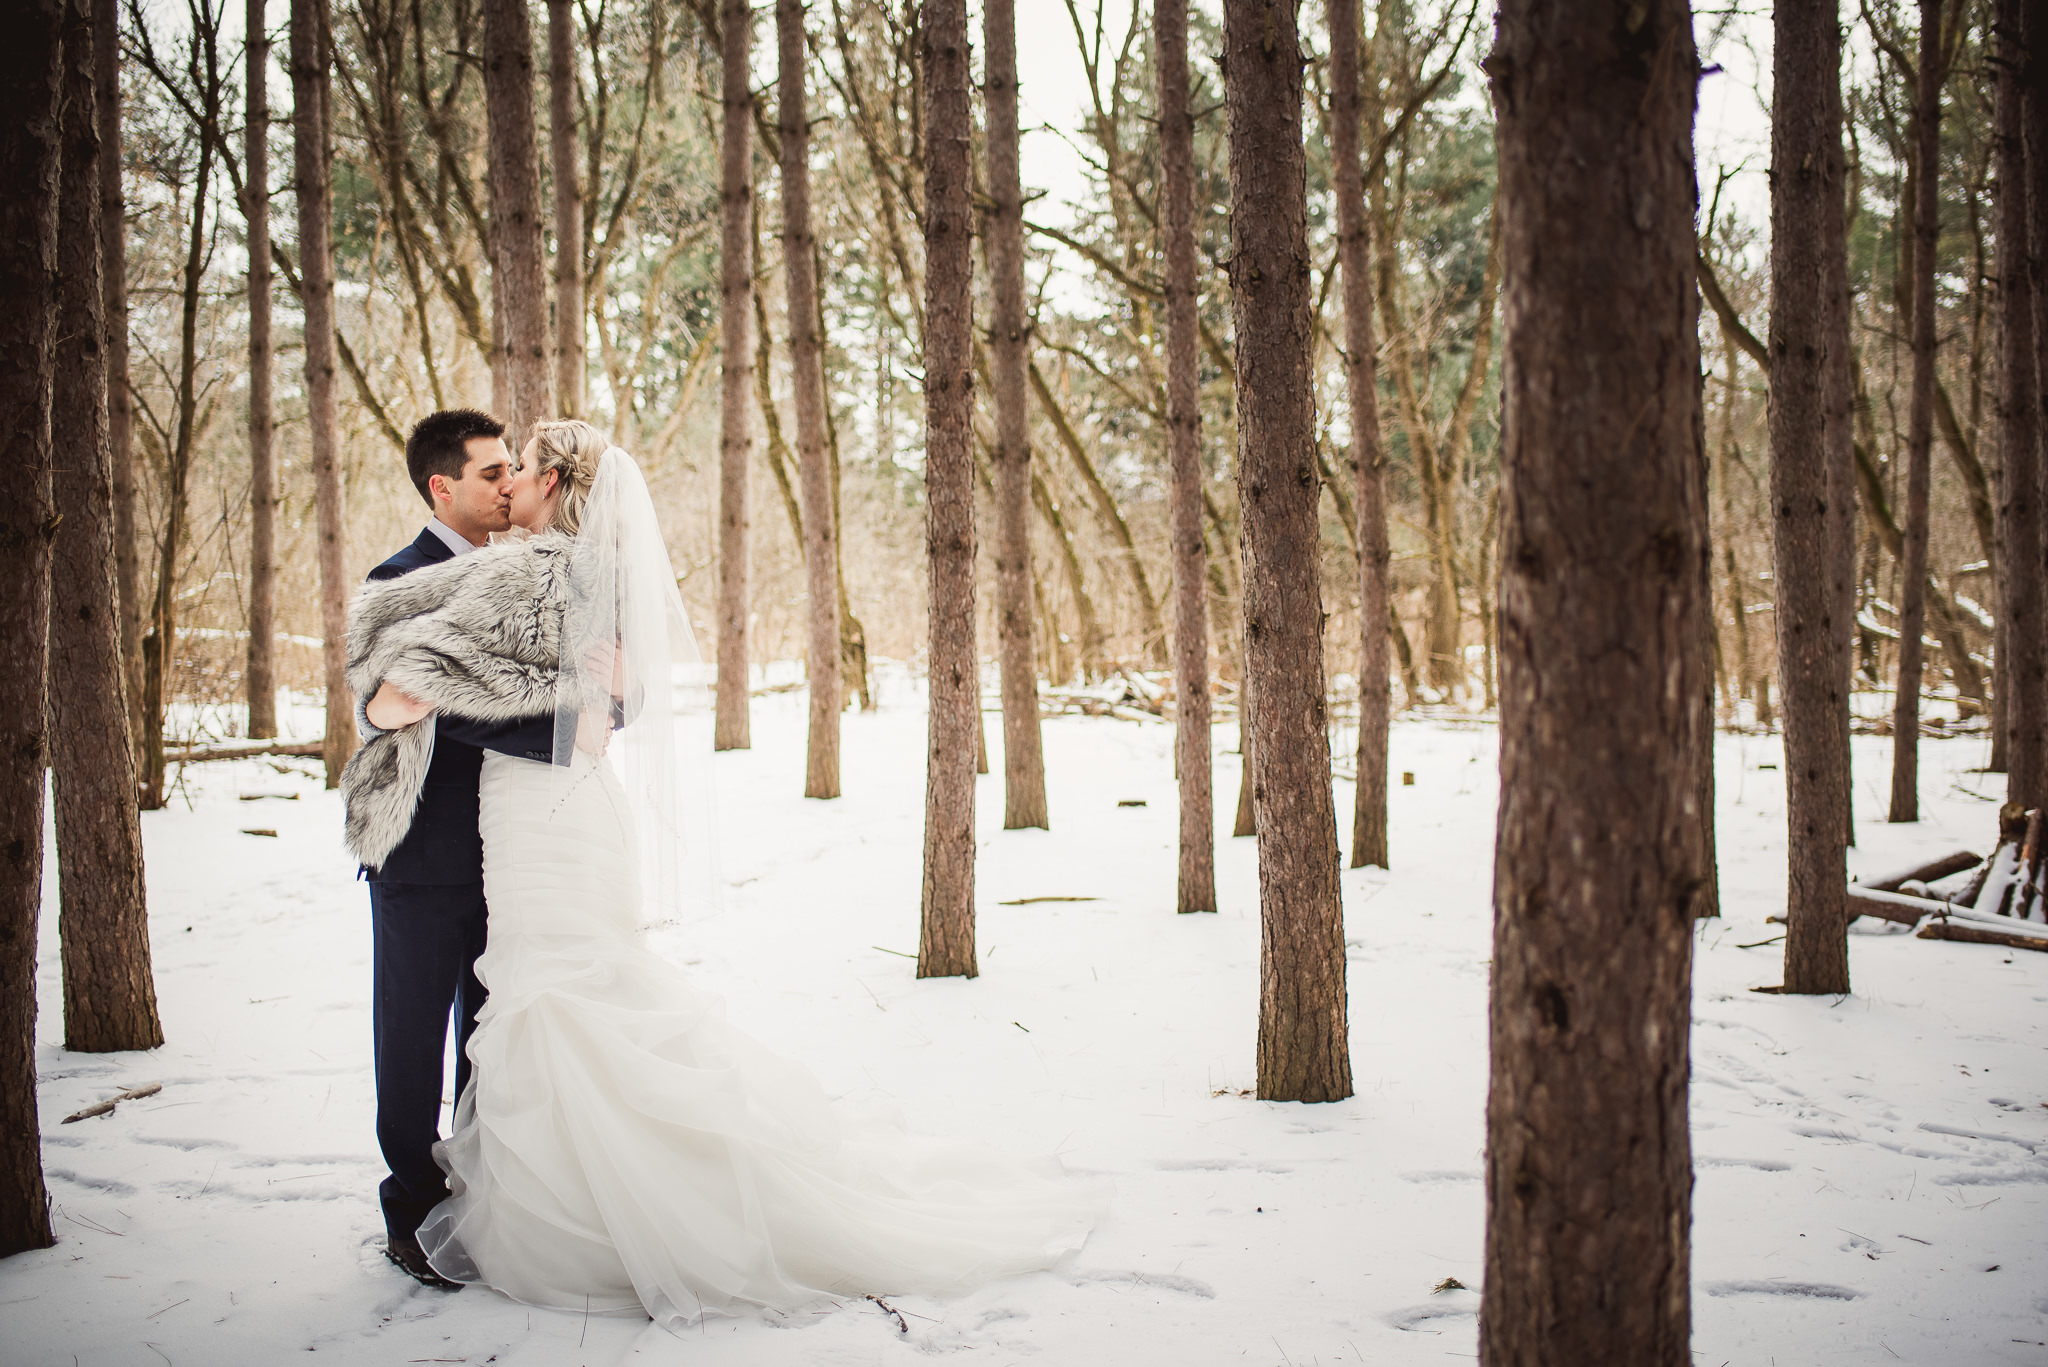 kortright center winter wedding photos 151 - Kortright Center Winter Wedding Photos